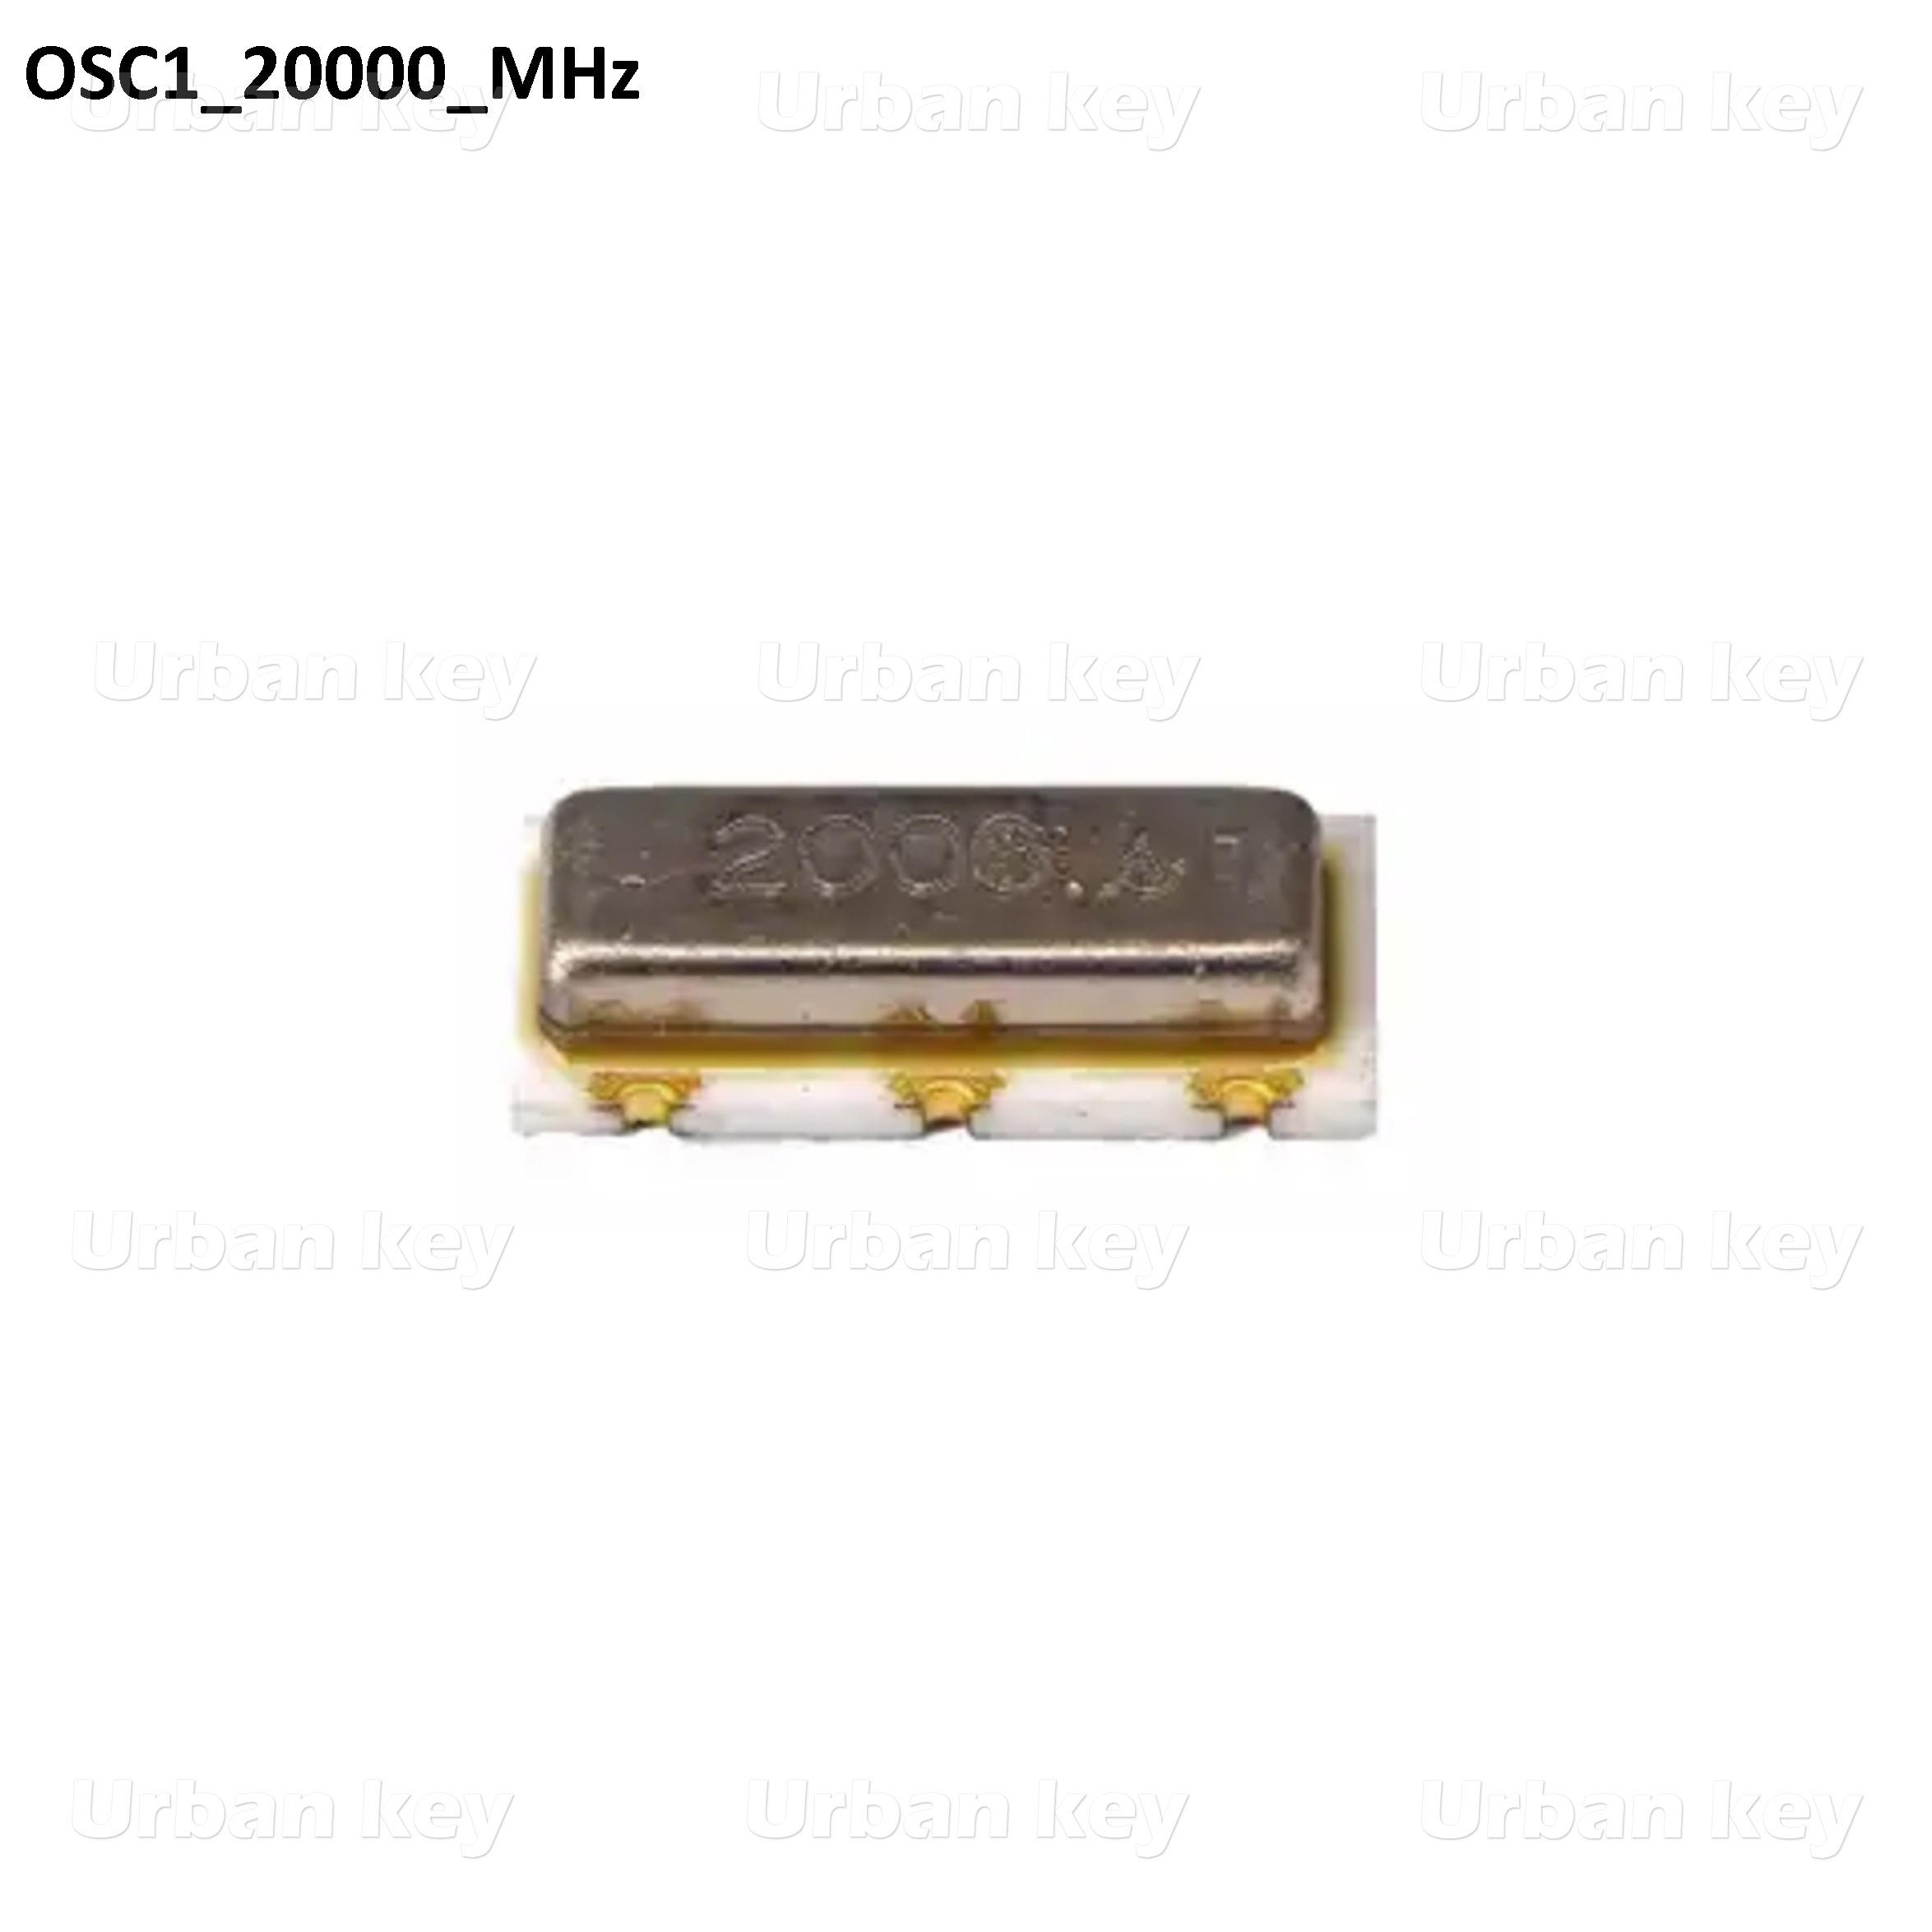 CRYSTAL OSCILADOR 20000_MHz